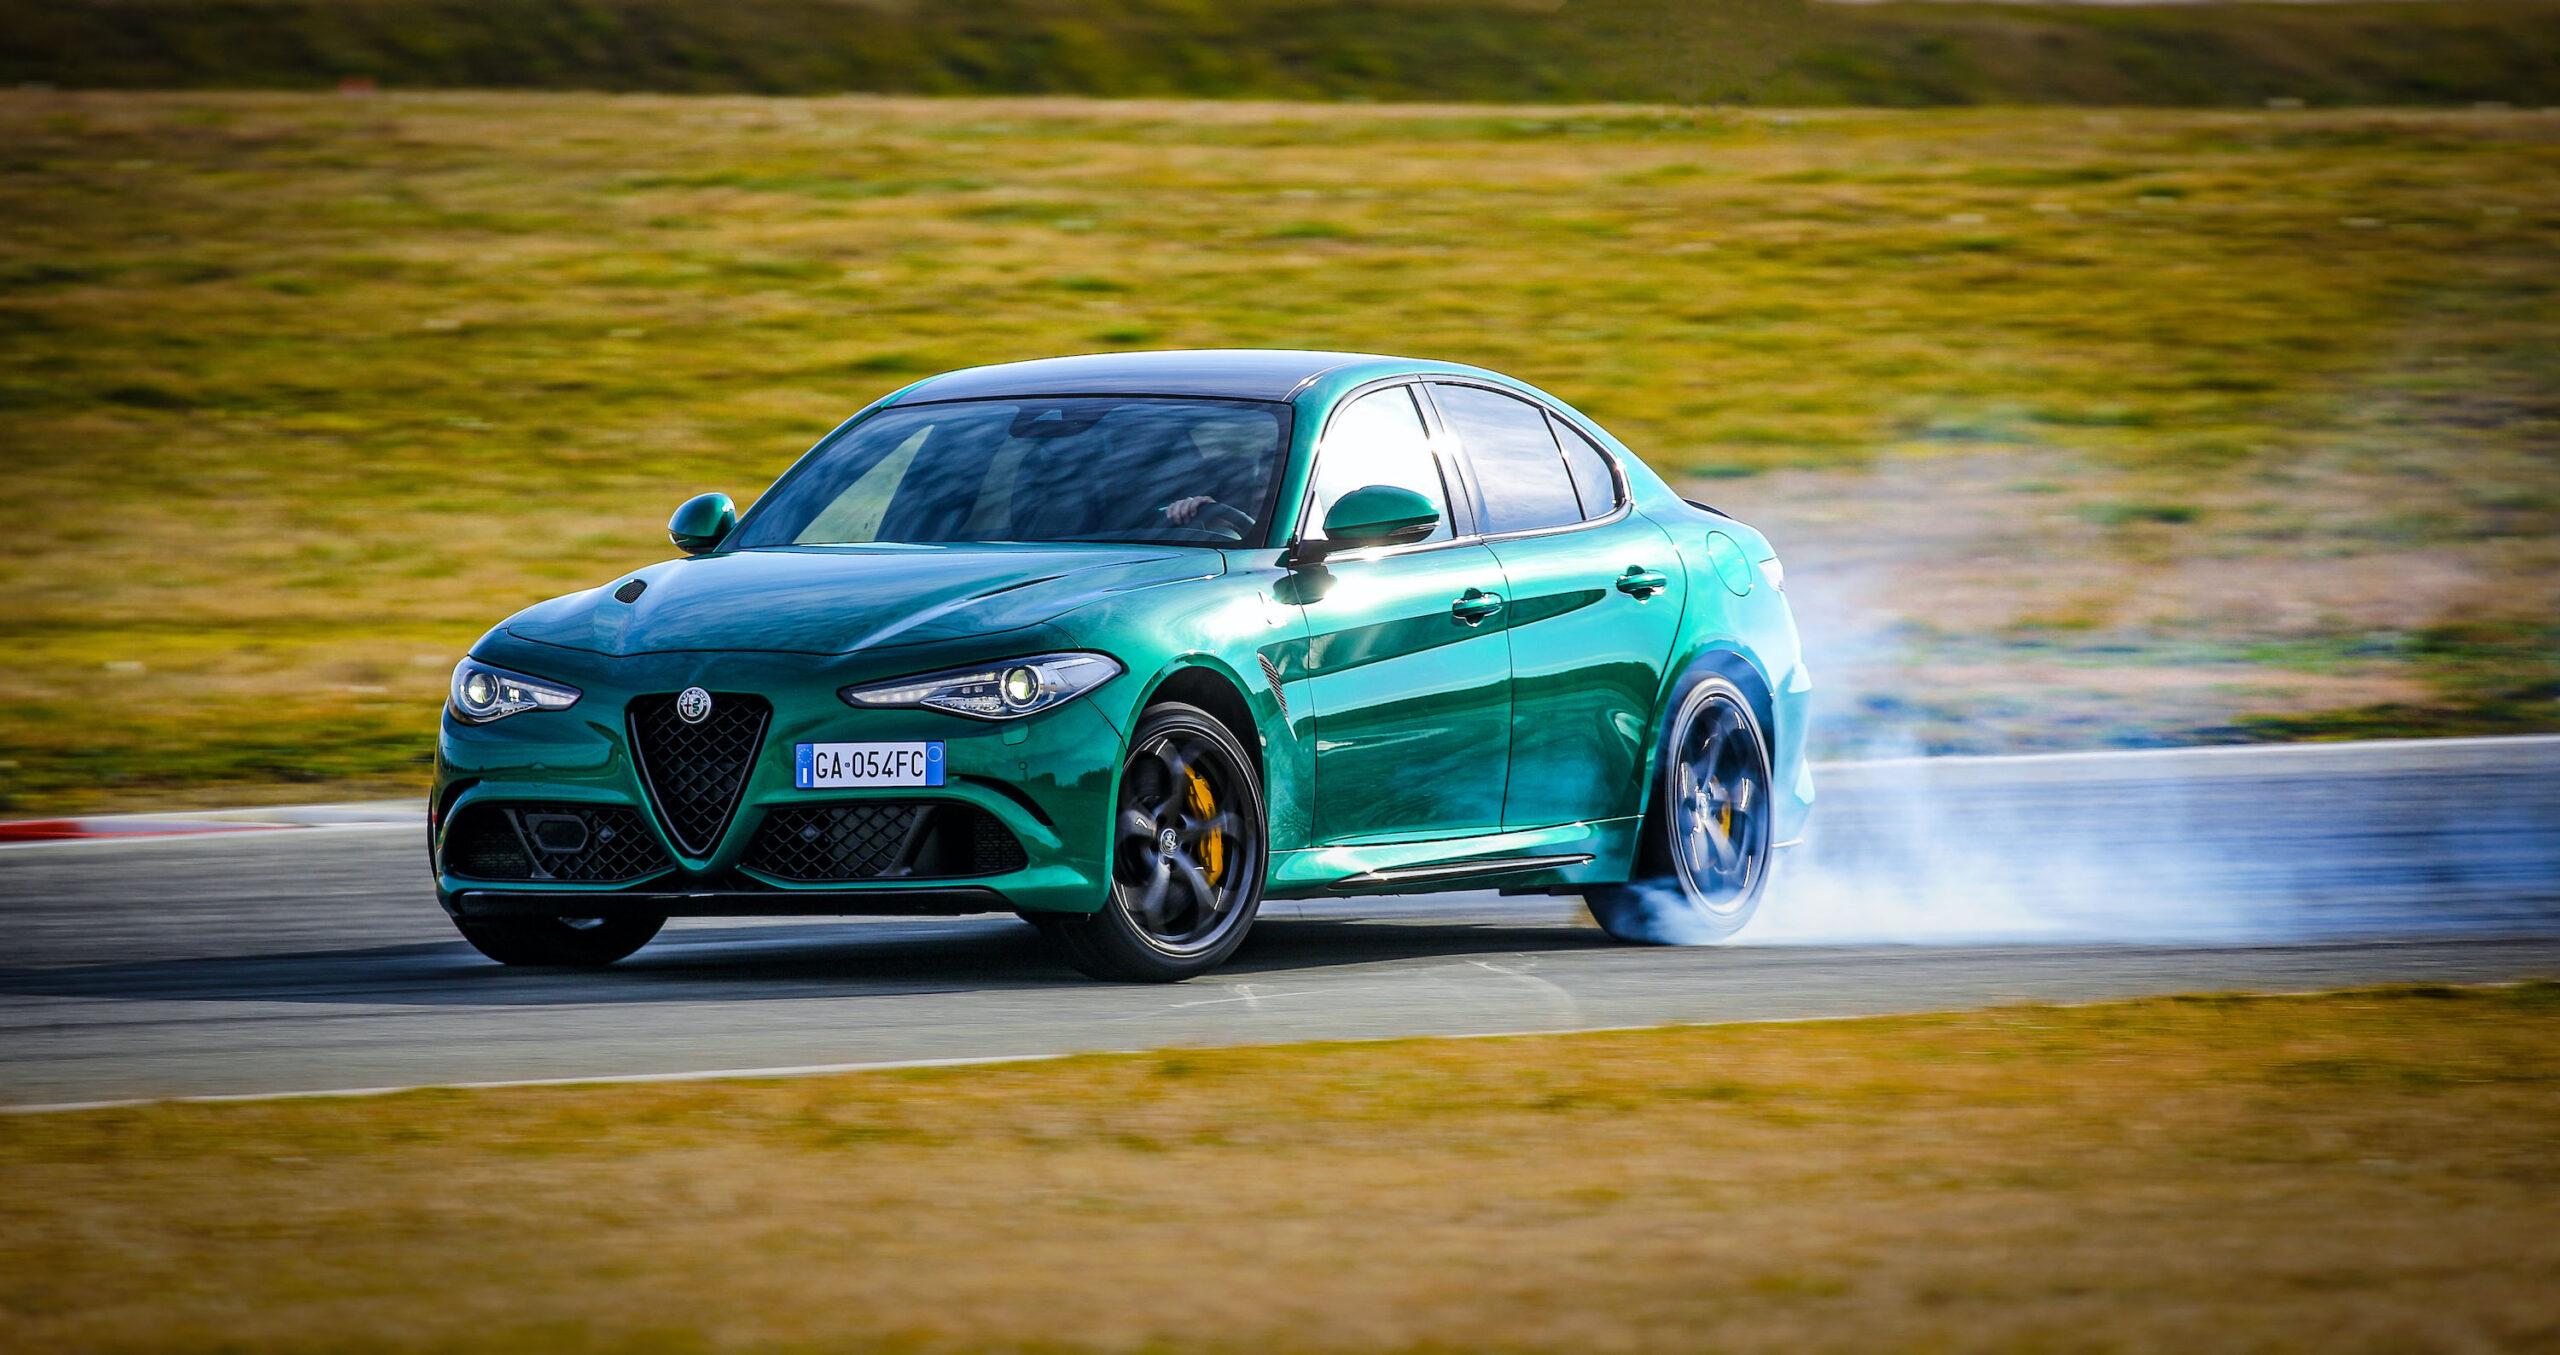 Is Alfa Romeo Giulia Quadrifoglio Facelift a threat to the new BMW M3?